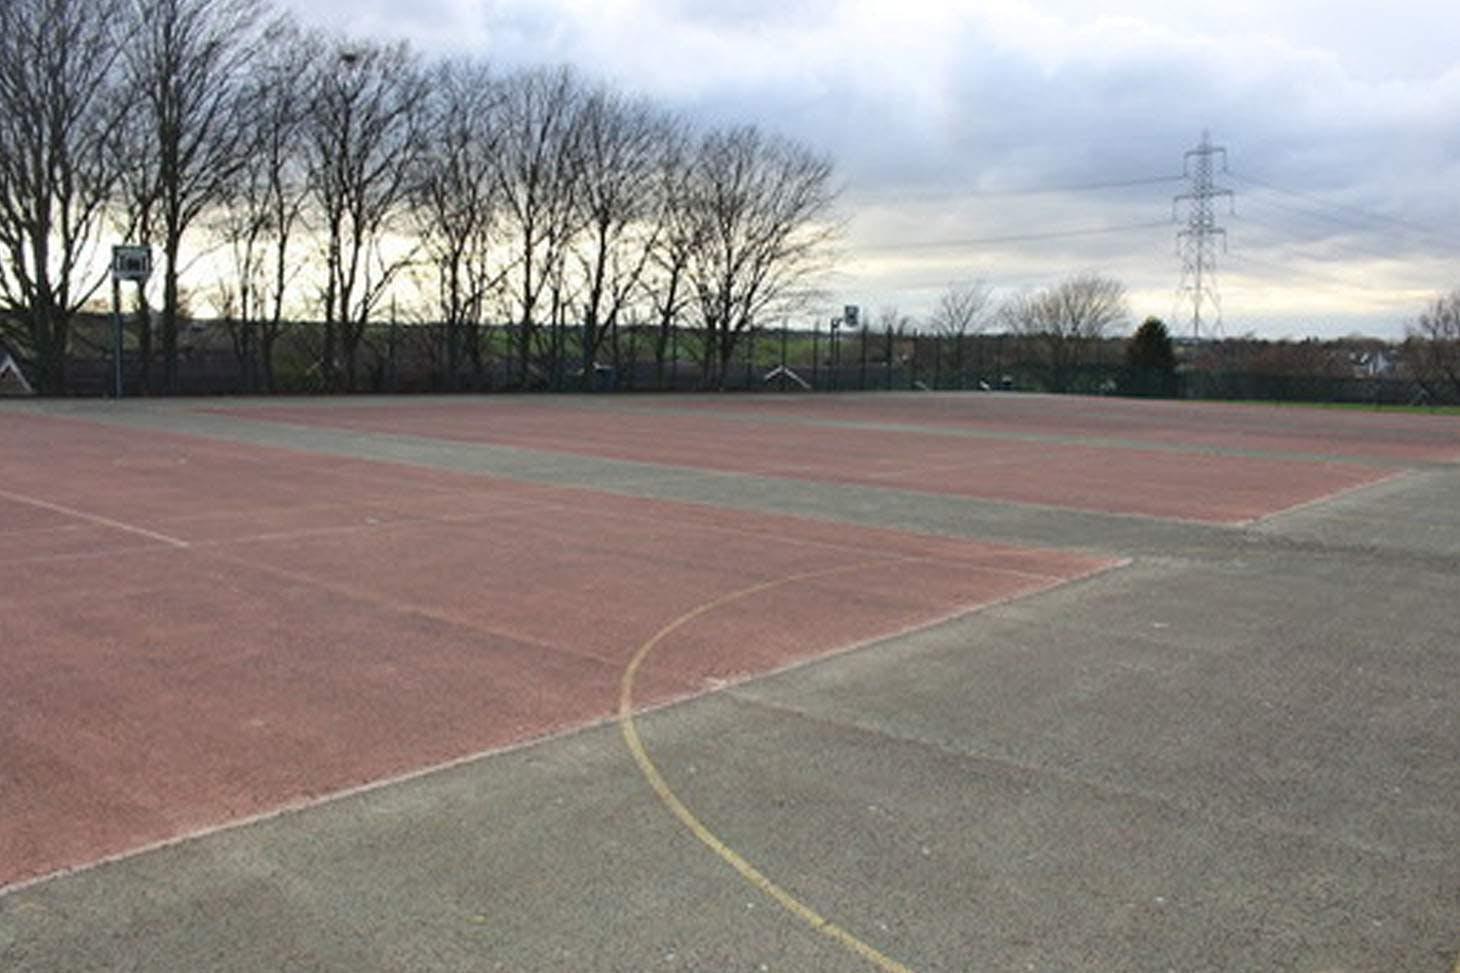 Egglescliffe School Outdoor | Hard (macadam) basketball court